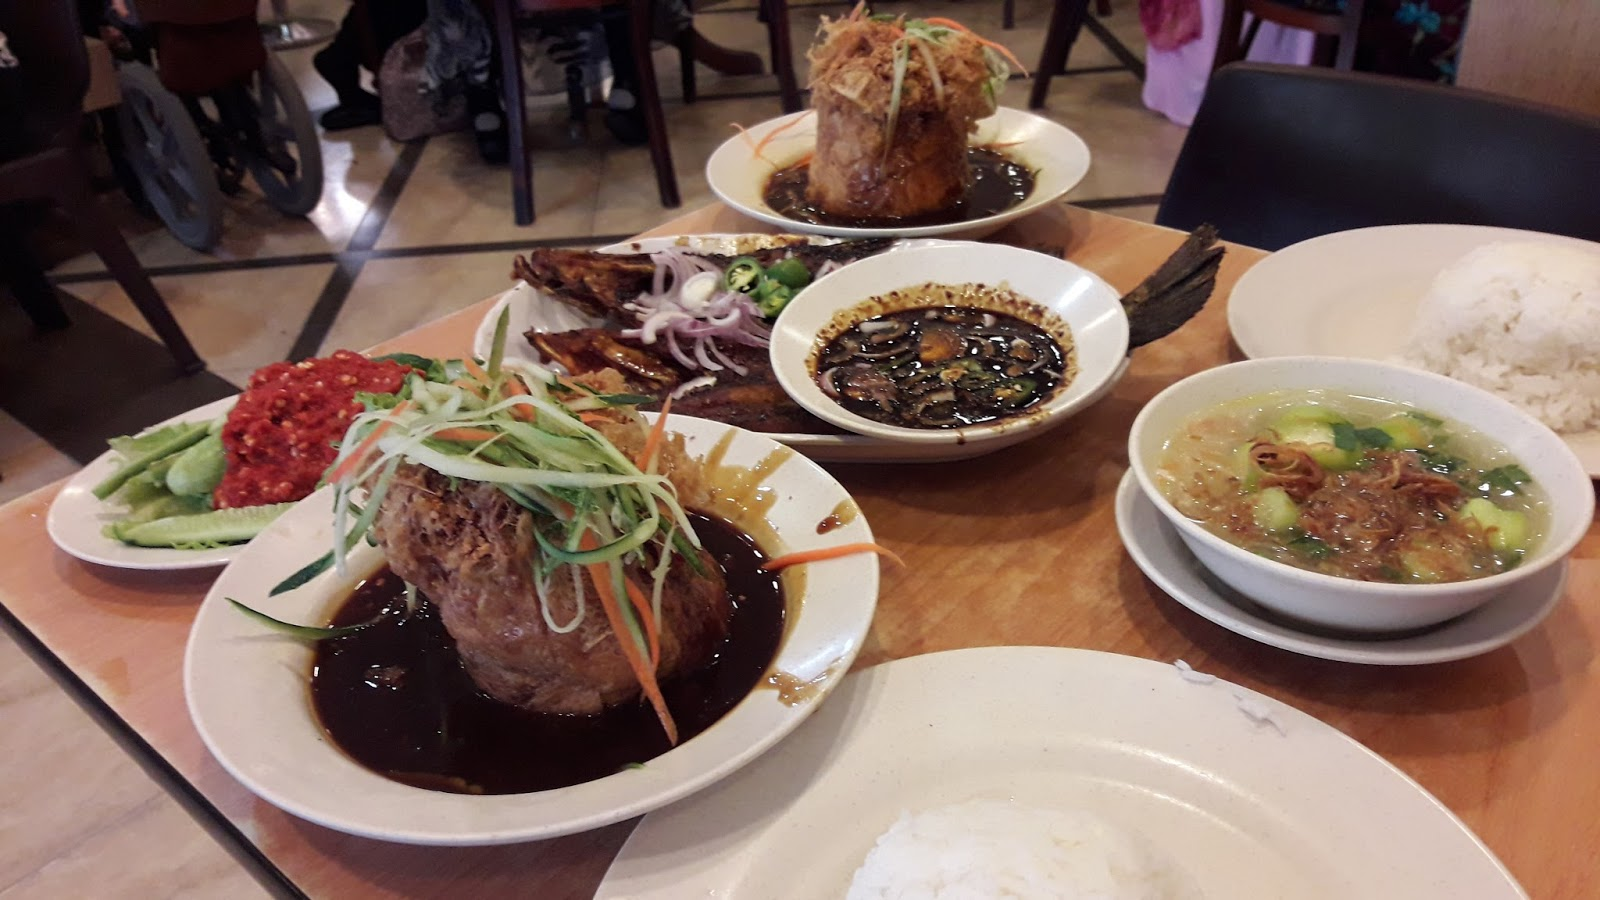 Menikmati Kuliner Halal Di Singapura Travel With Emil Ikea Soda Sedotan Minuman Merah Muda Atau Toska Kuning 200 P Hajjah Maimunah